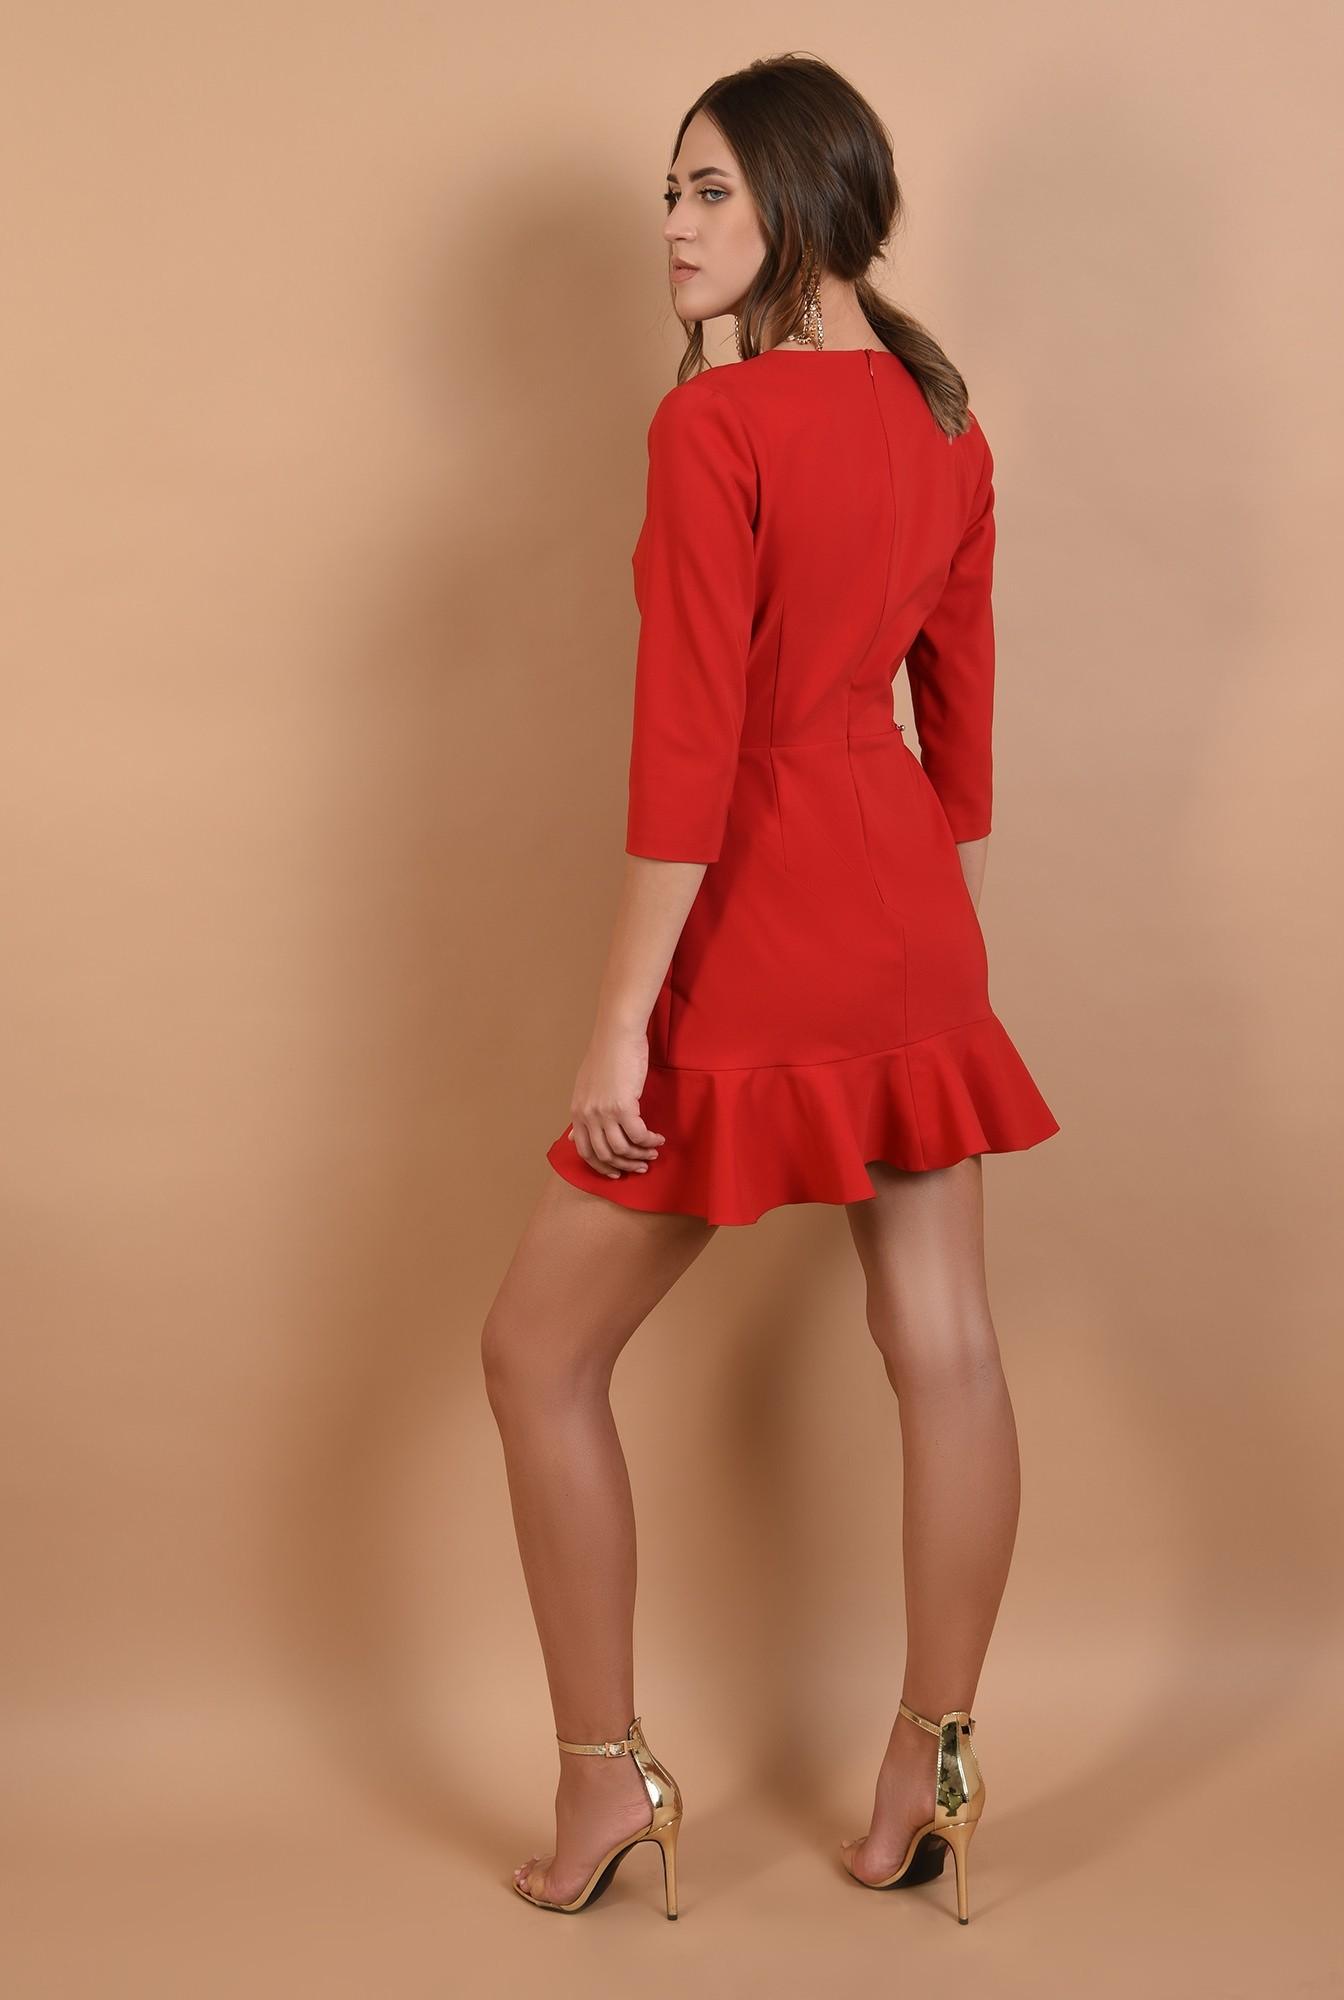 1 - rochie de ocazie, rosie, Poema, croi petrecut, volane